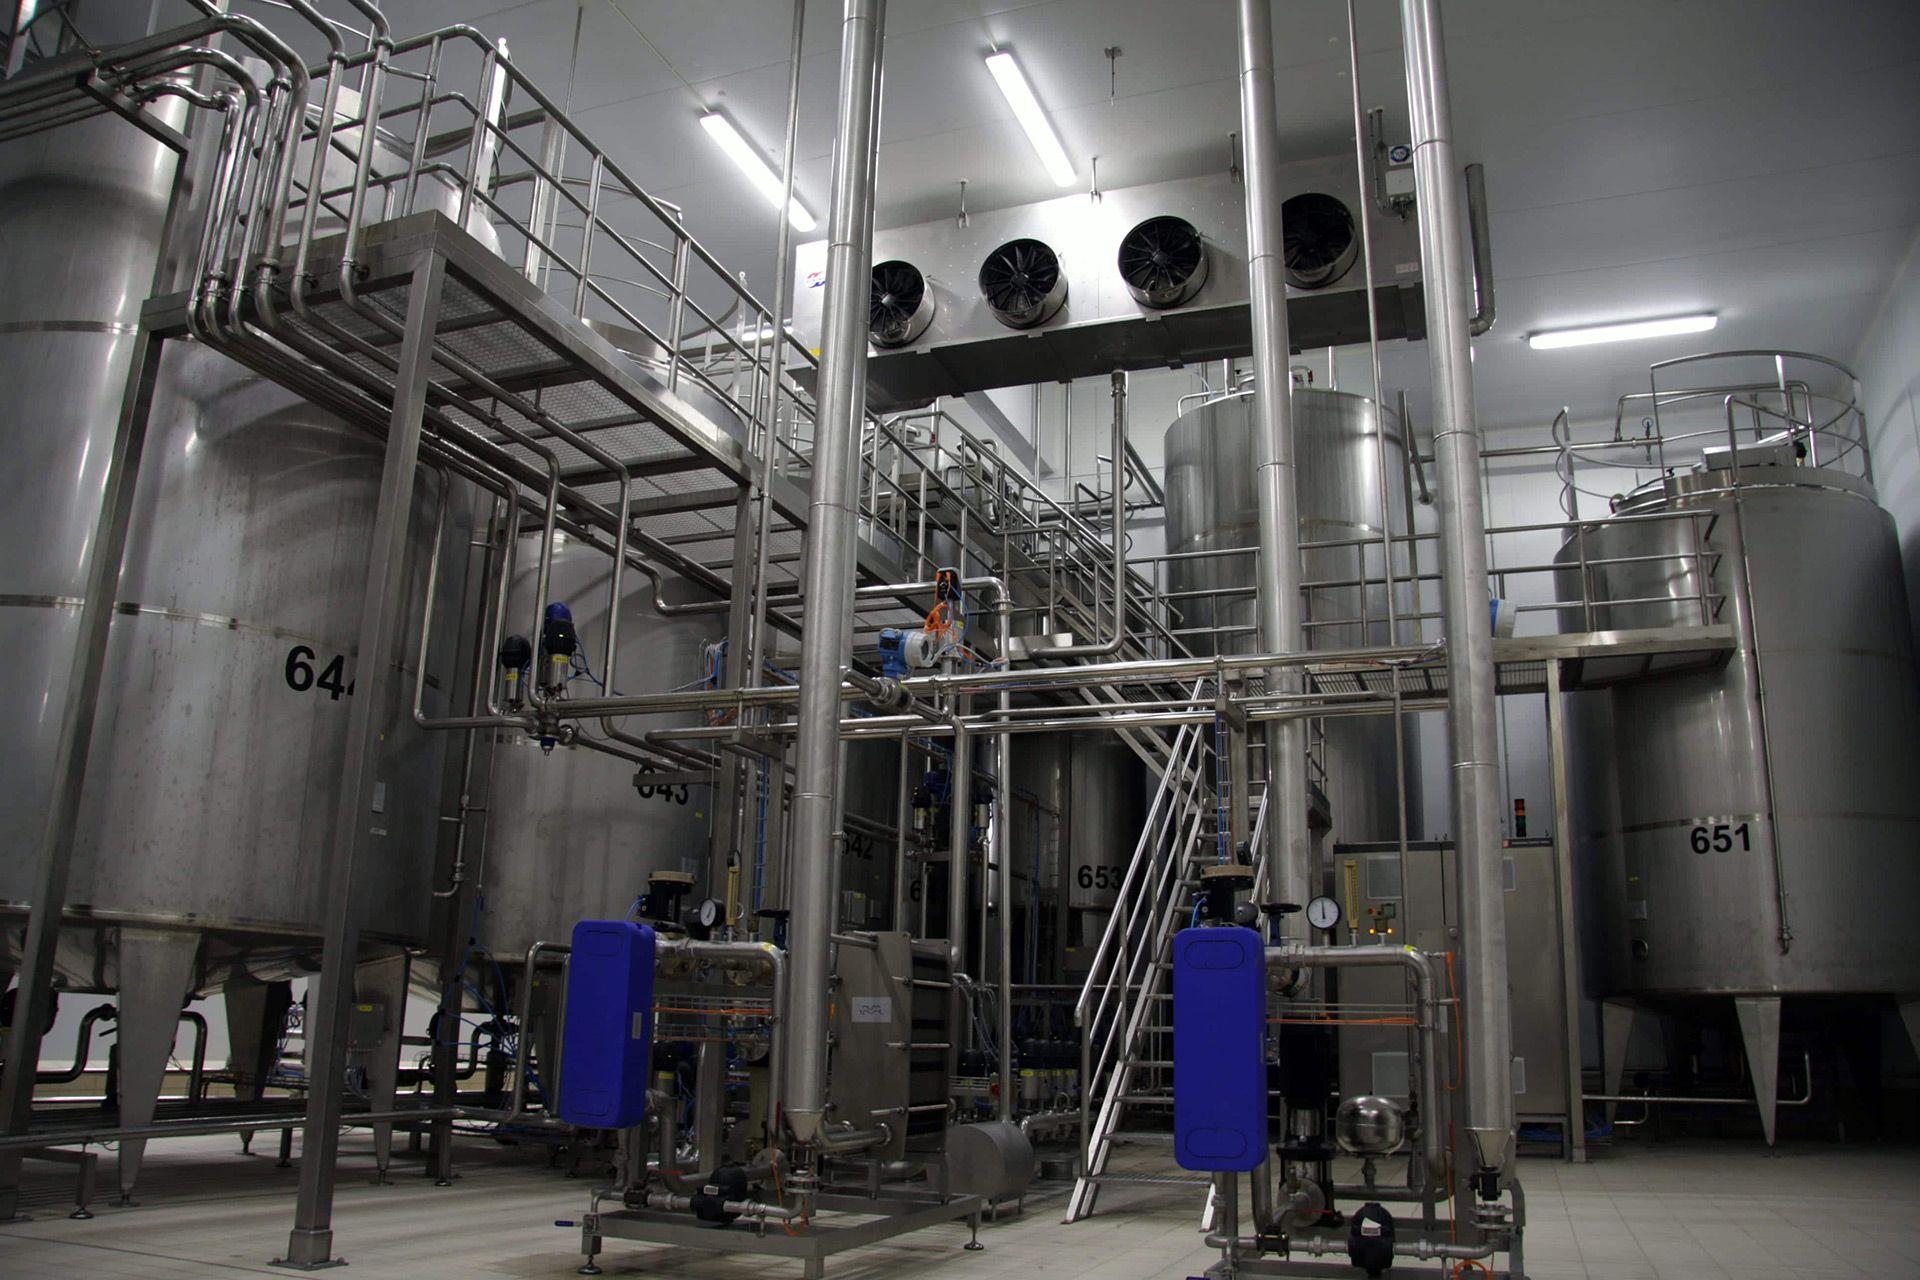 KRI KRI Dairy plant